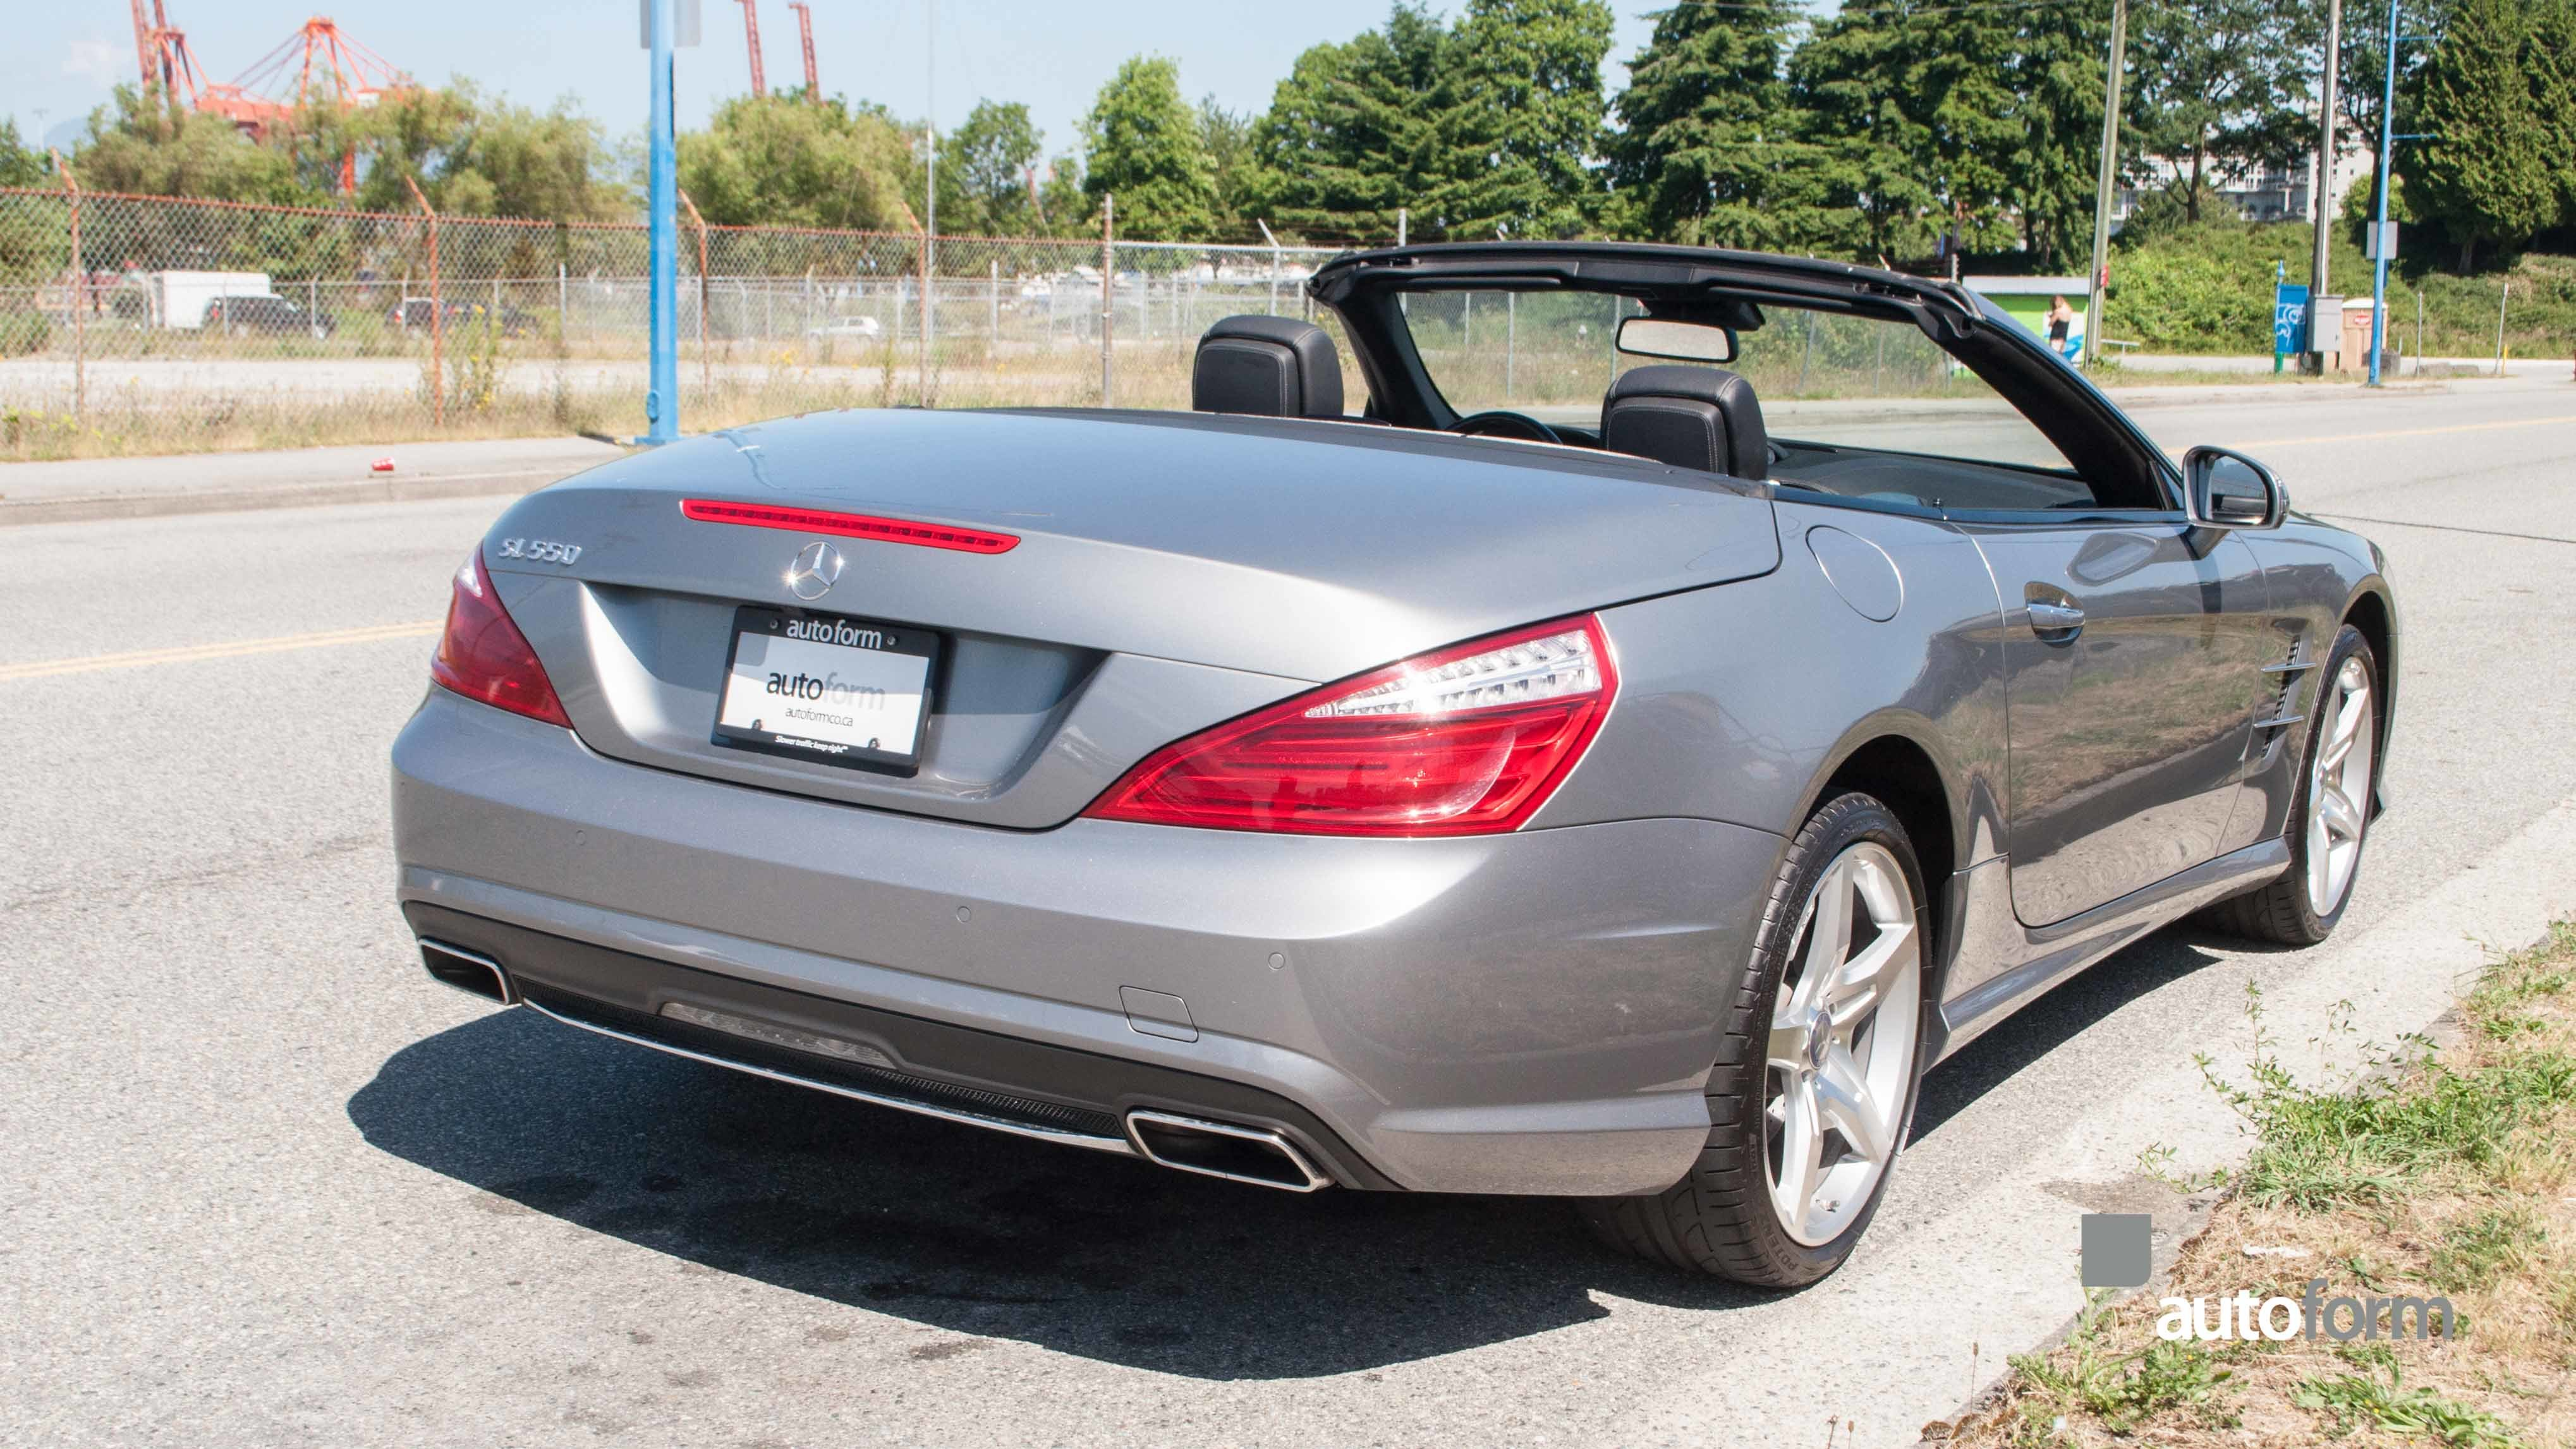 2013 mercedes benz sl550 autoform for Mercedes benz vancouver